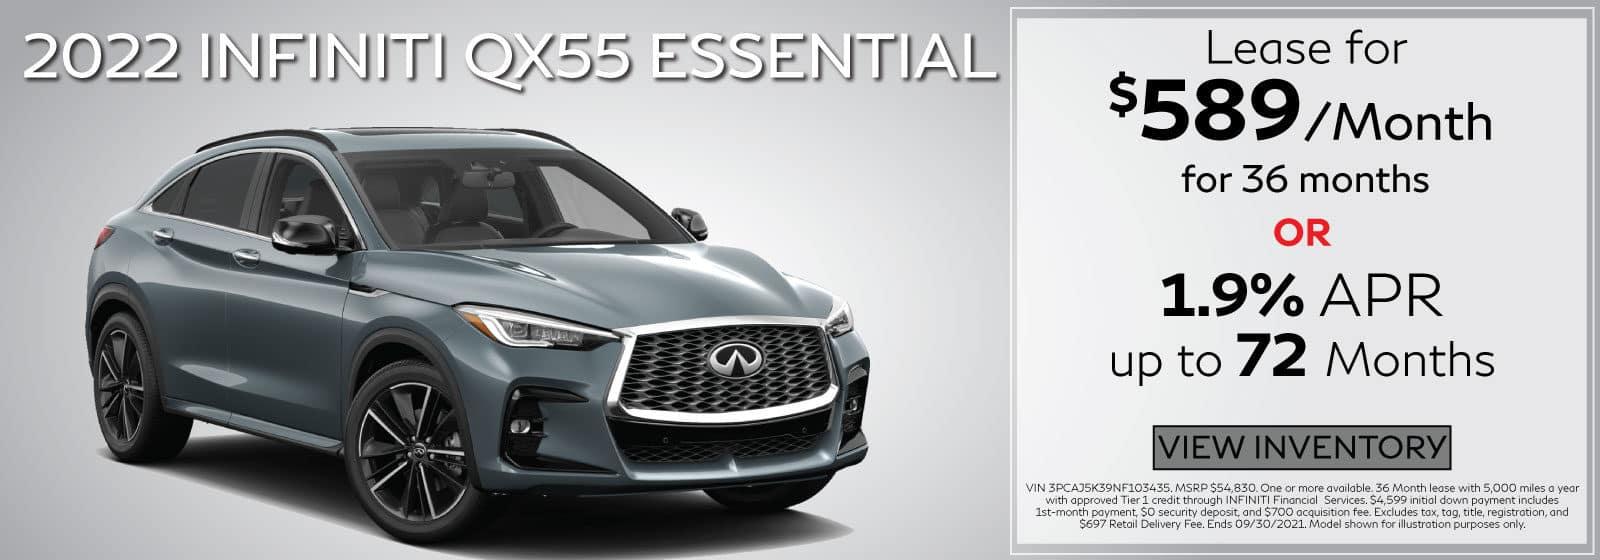 September-Mobile-Specials-QX55-Updated